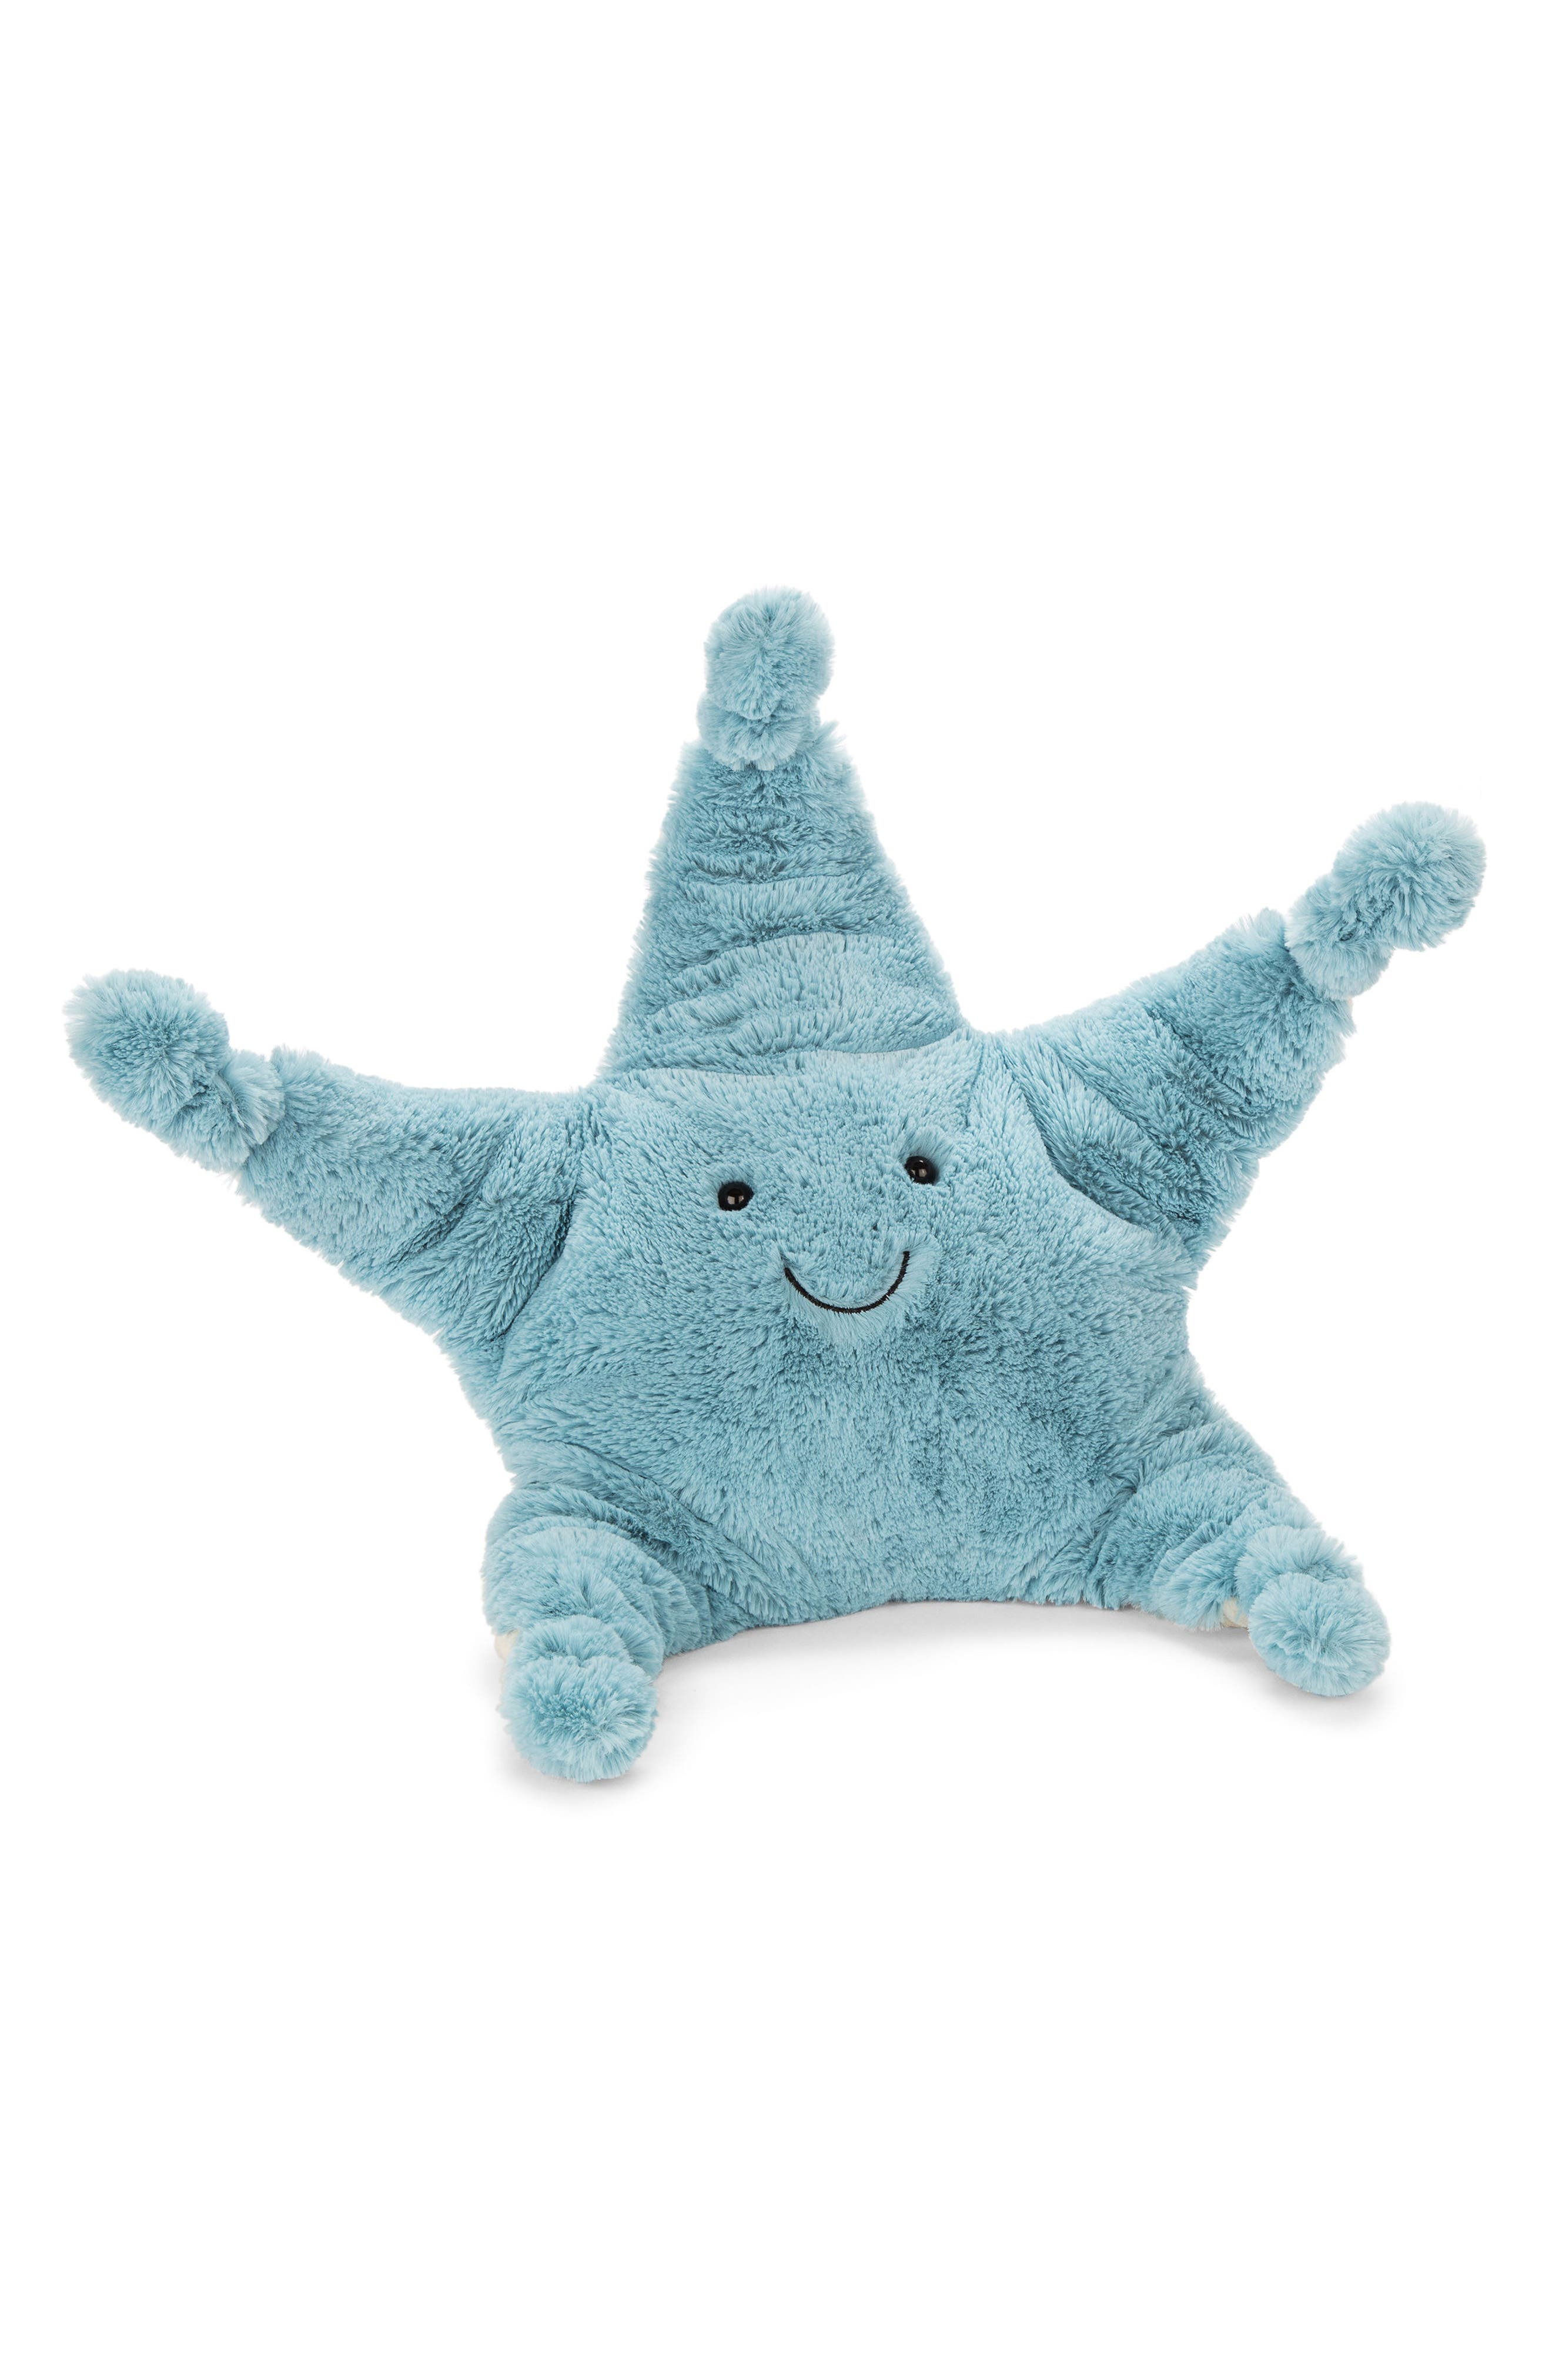 Skye Starfish Stuffed Animal,                             Main thumbnail 1, color,                             Blue